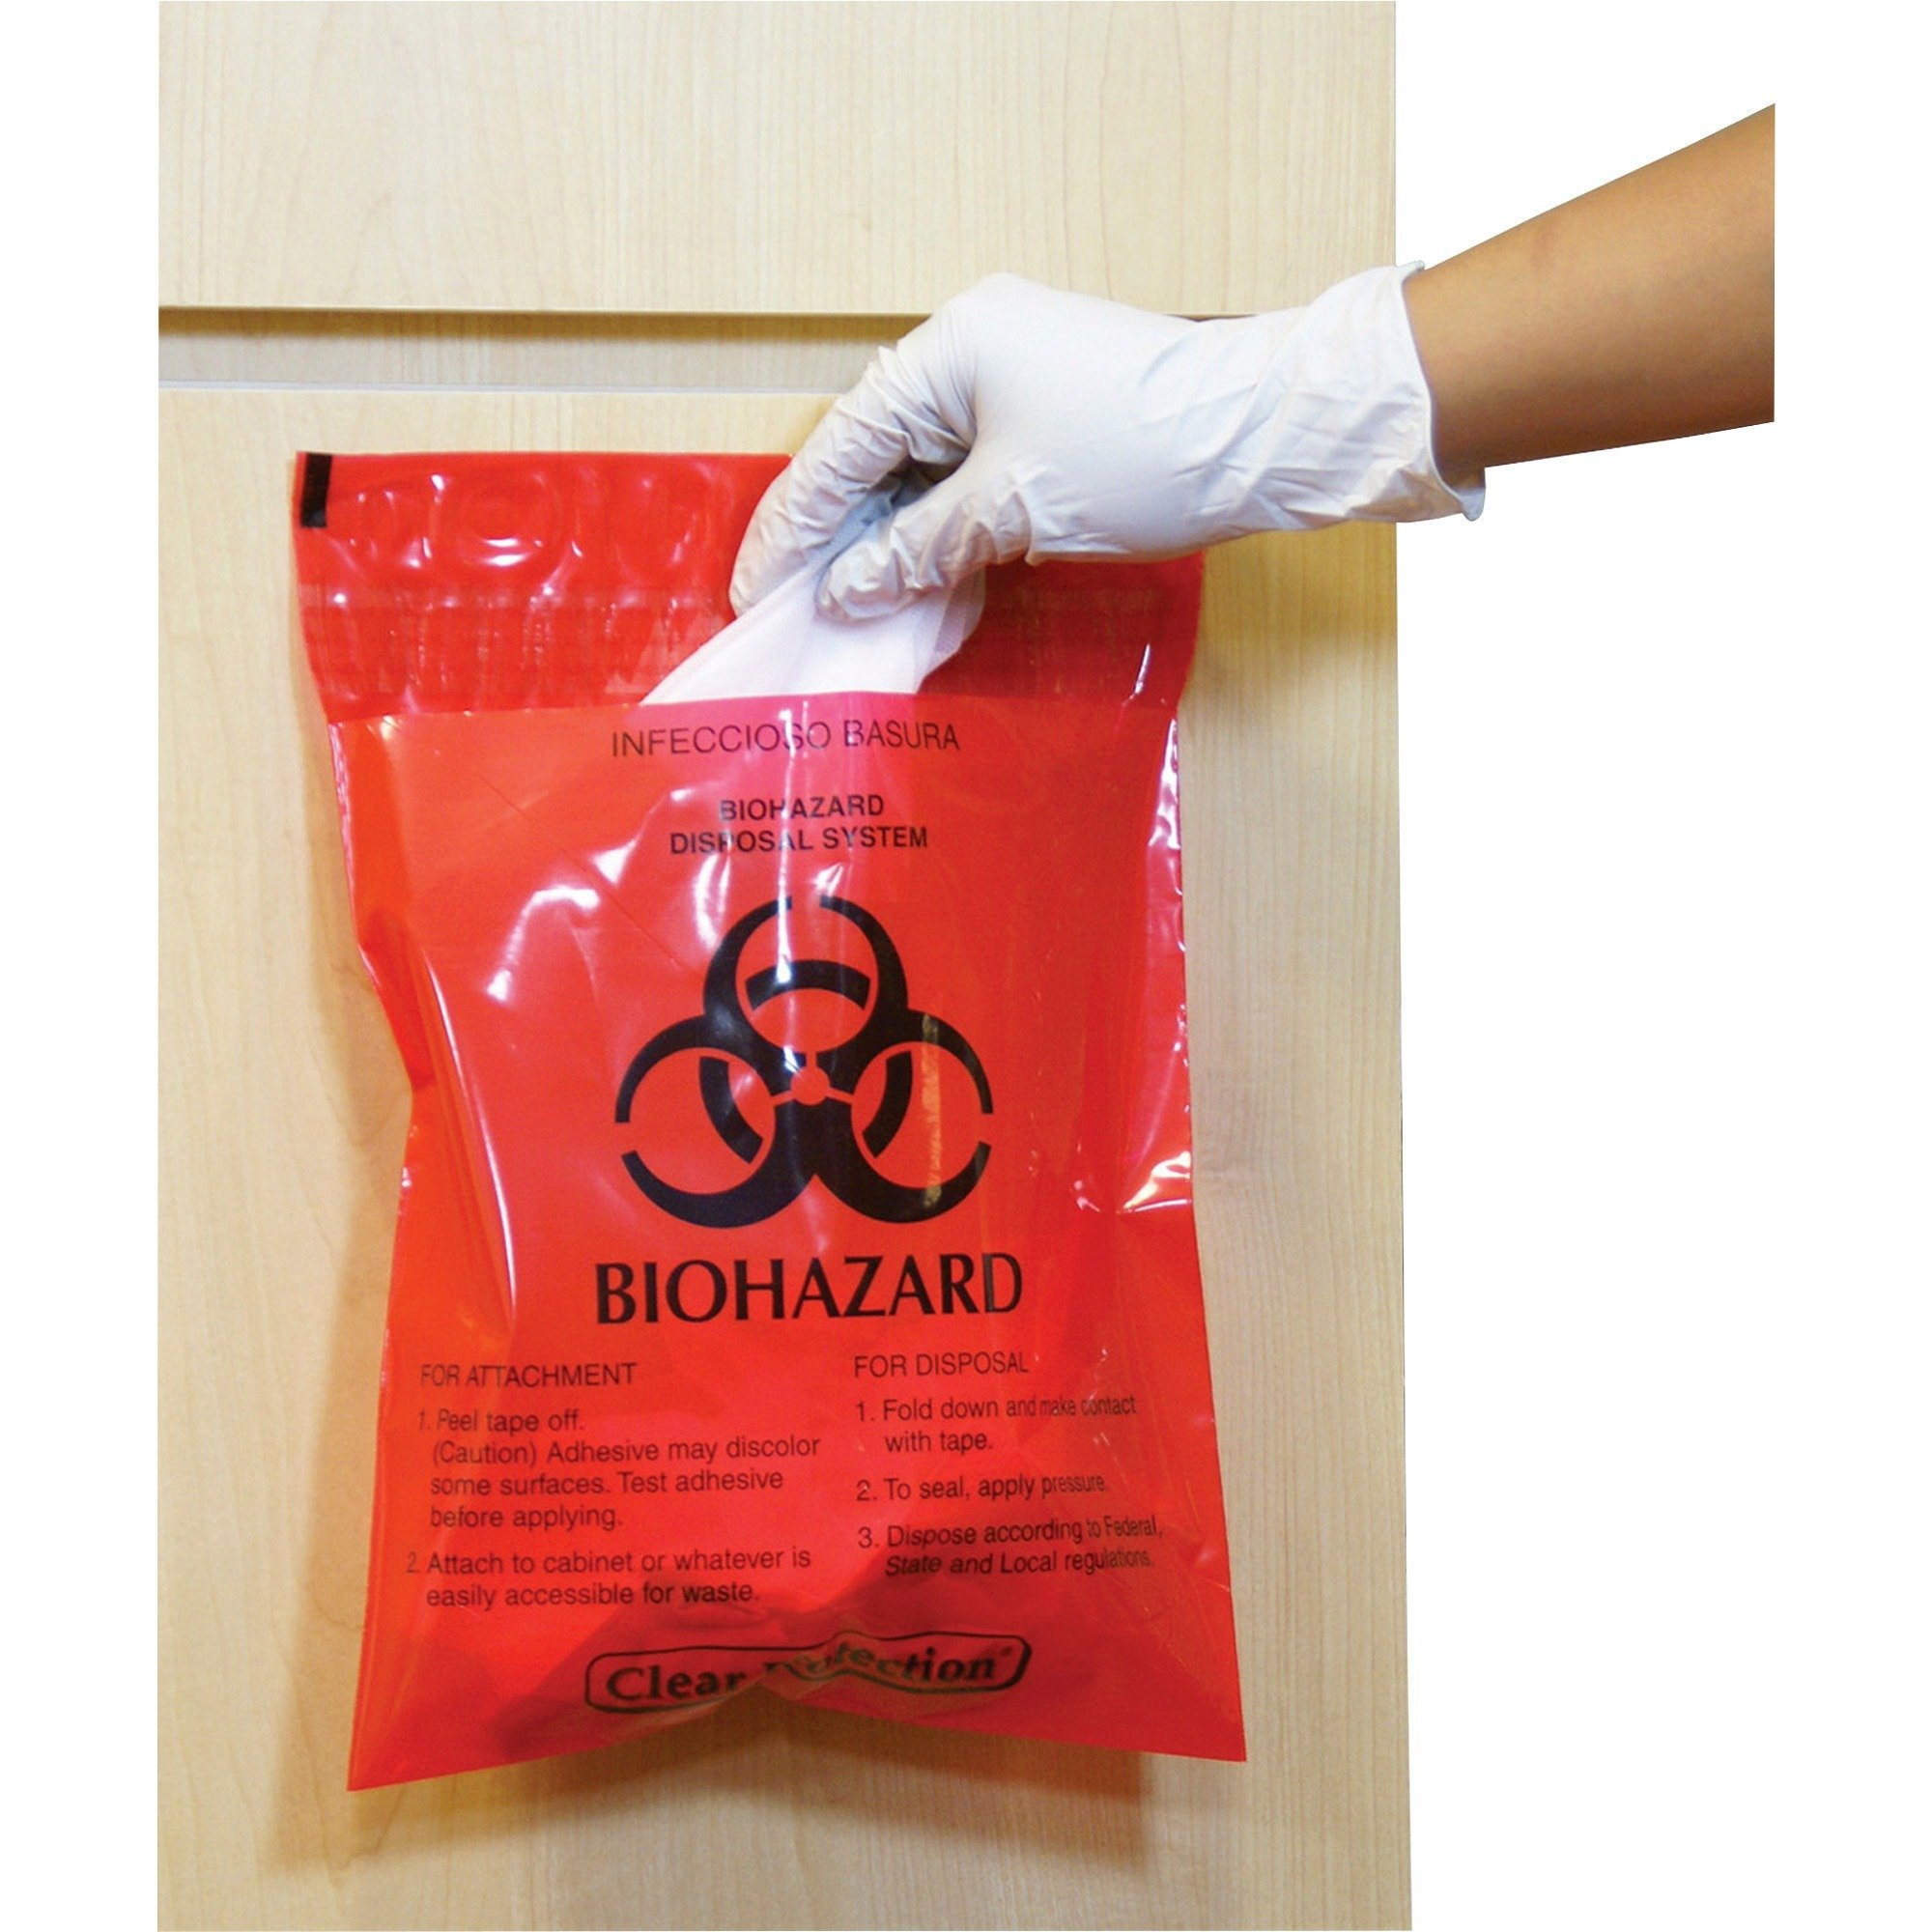 Caretek Resources CTRB042214 Biohazard Waste Bag Peel/Stick 2.6 Qt 12-Inch x14-Inch 100/BX RD by Caretek Resources